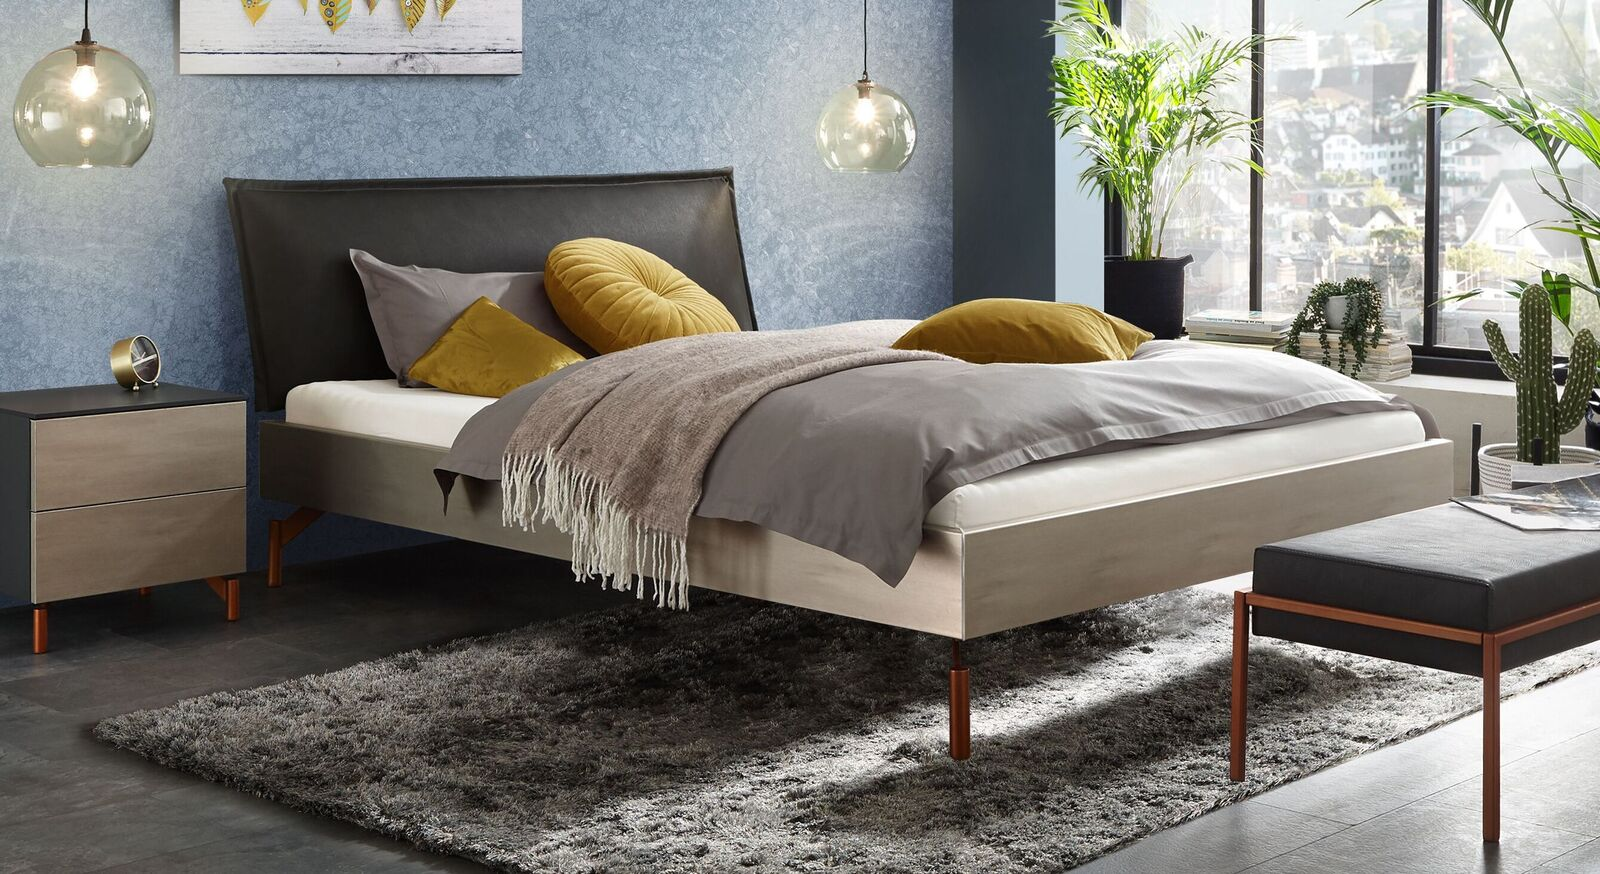 Trendiges Bett Istari aus silberfarbenem Dekor